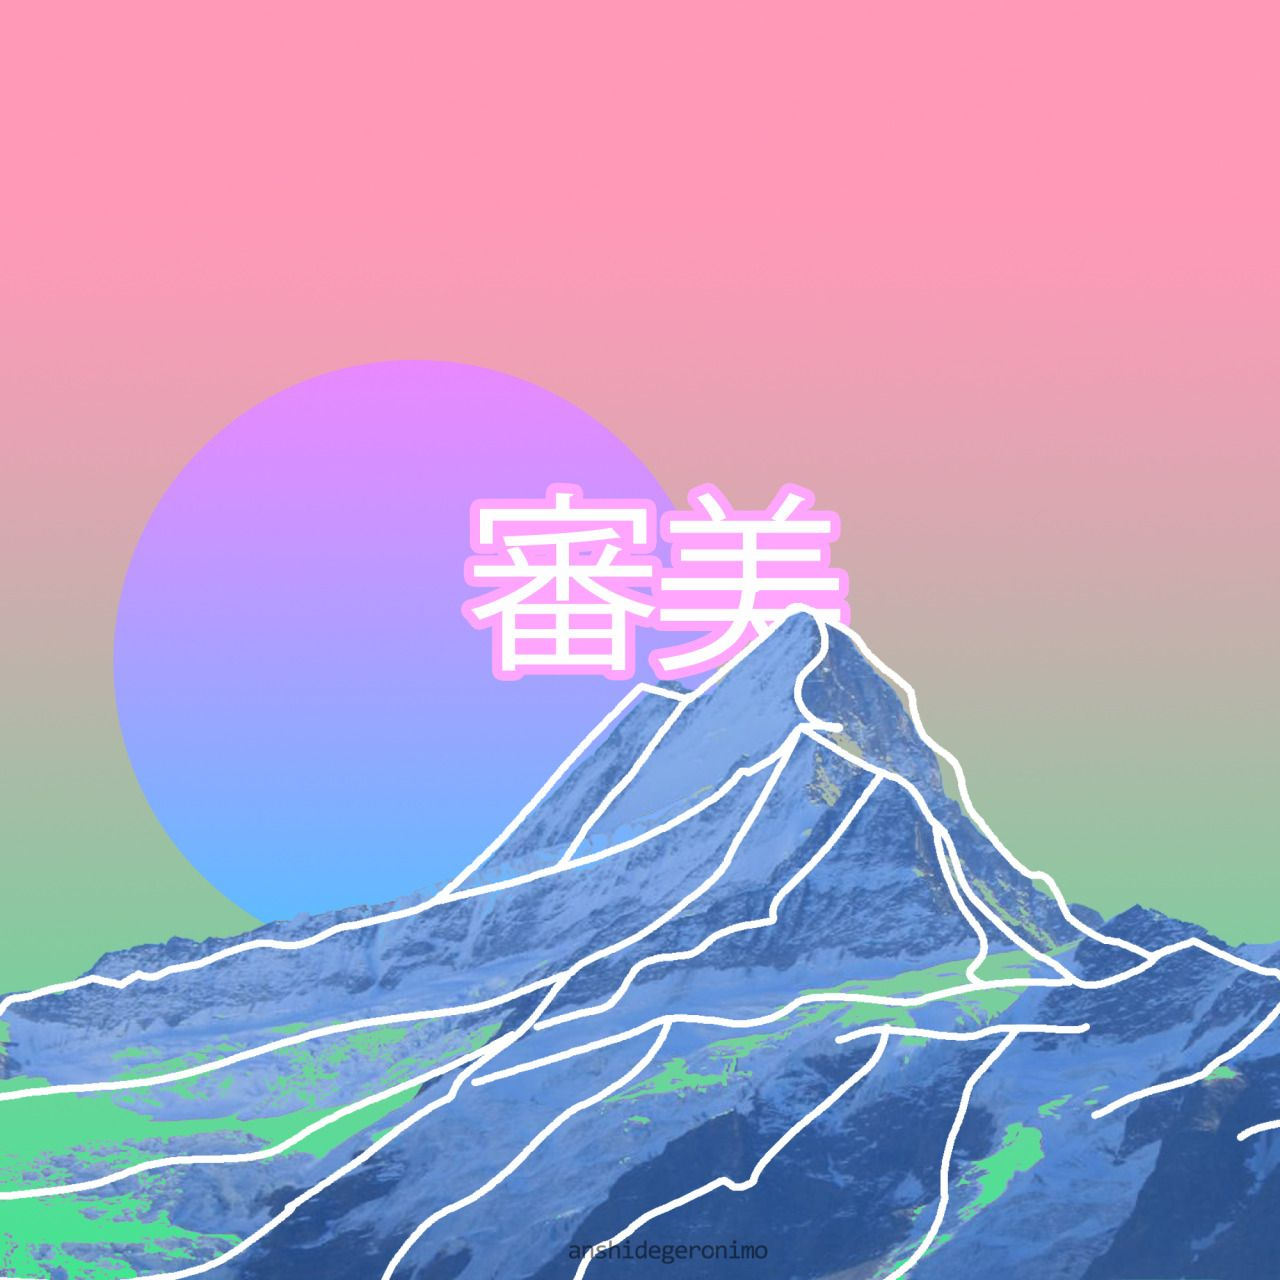 This gif has everything glitch pixel art graphic design vaporwave - Image Result For Japanese Glitch Art Vaporwave